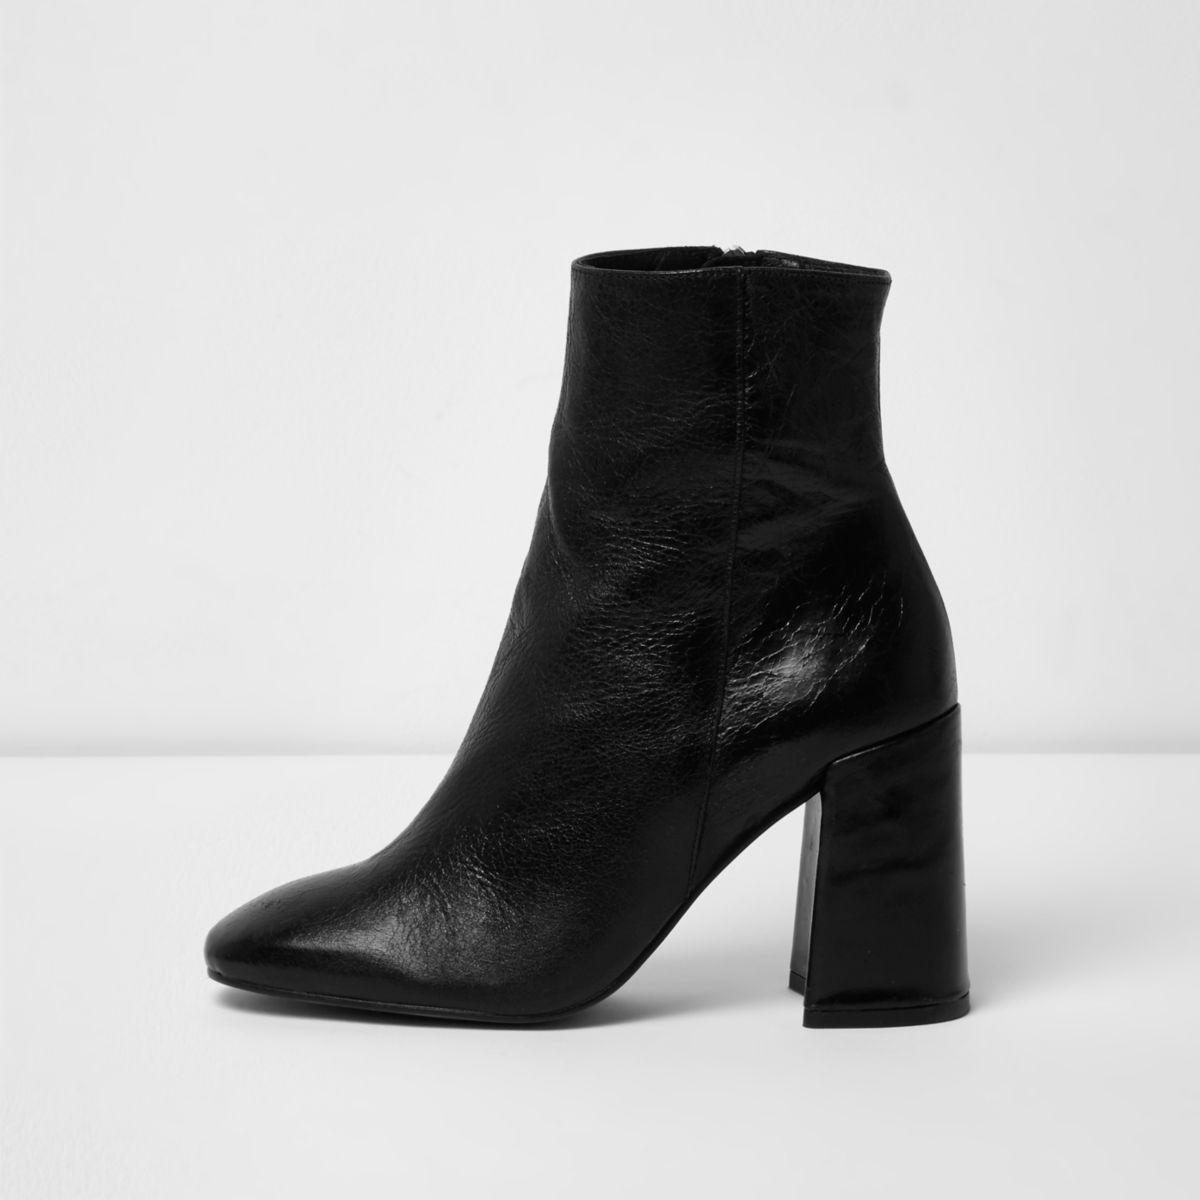 Black leather block heel boots